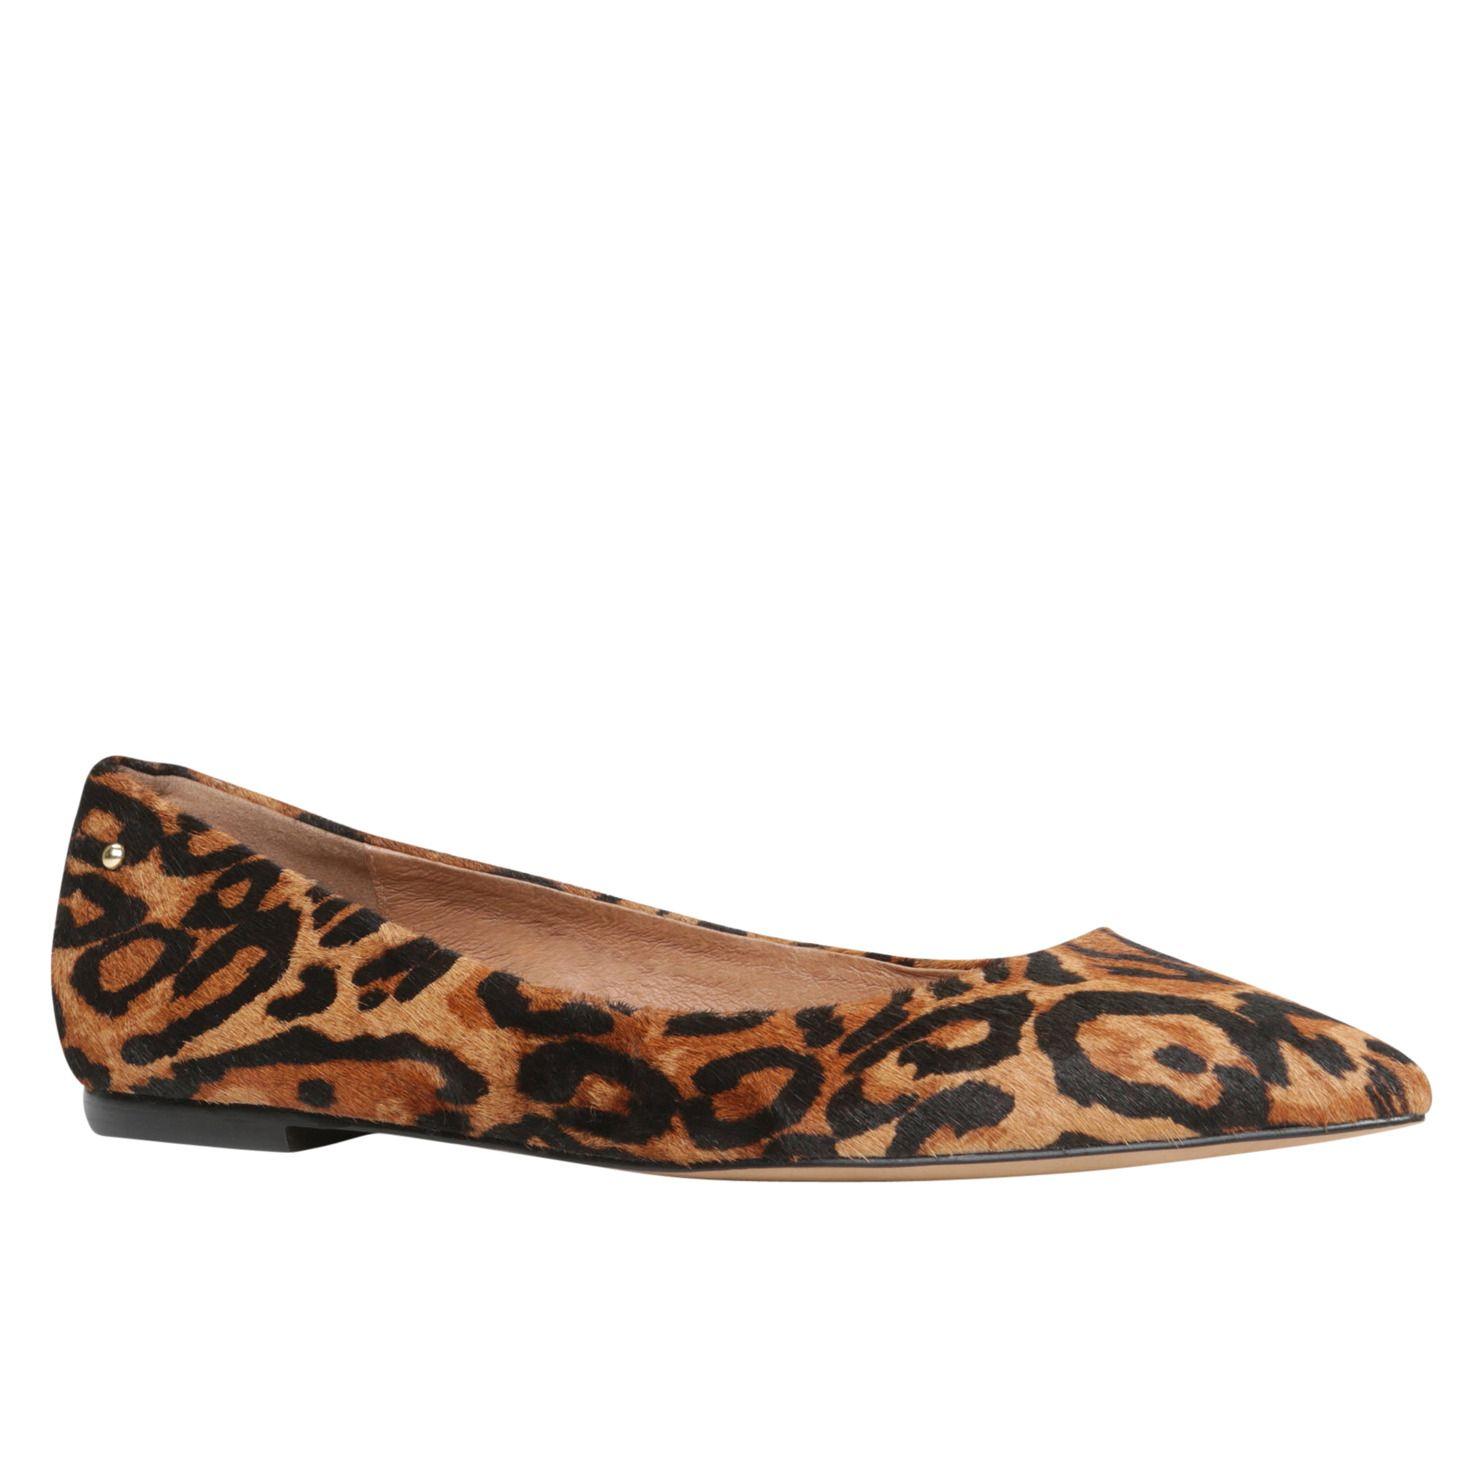 499a06808 Too much leopard.... Never!! ORMELLE - femmes's talon plat ...